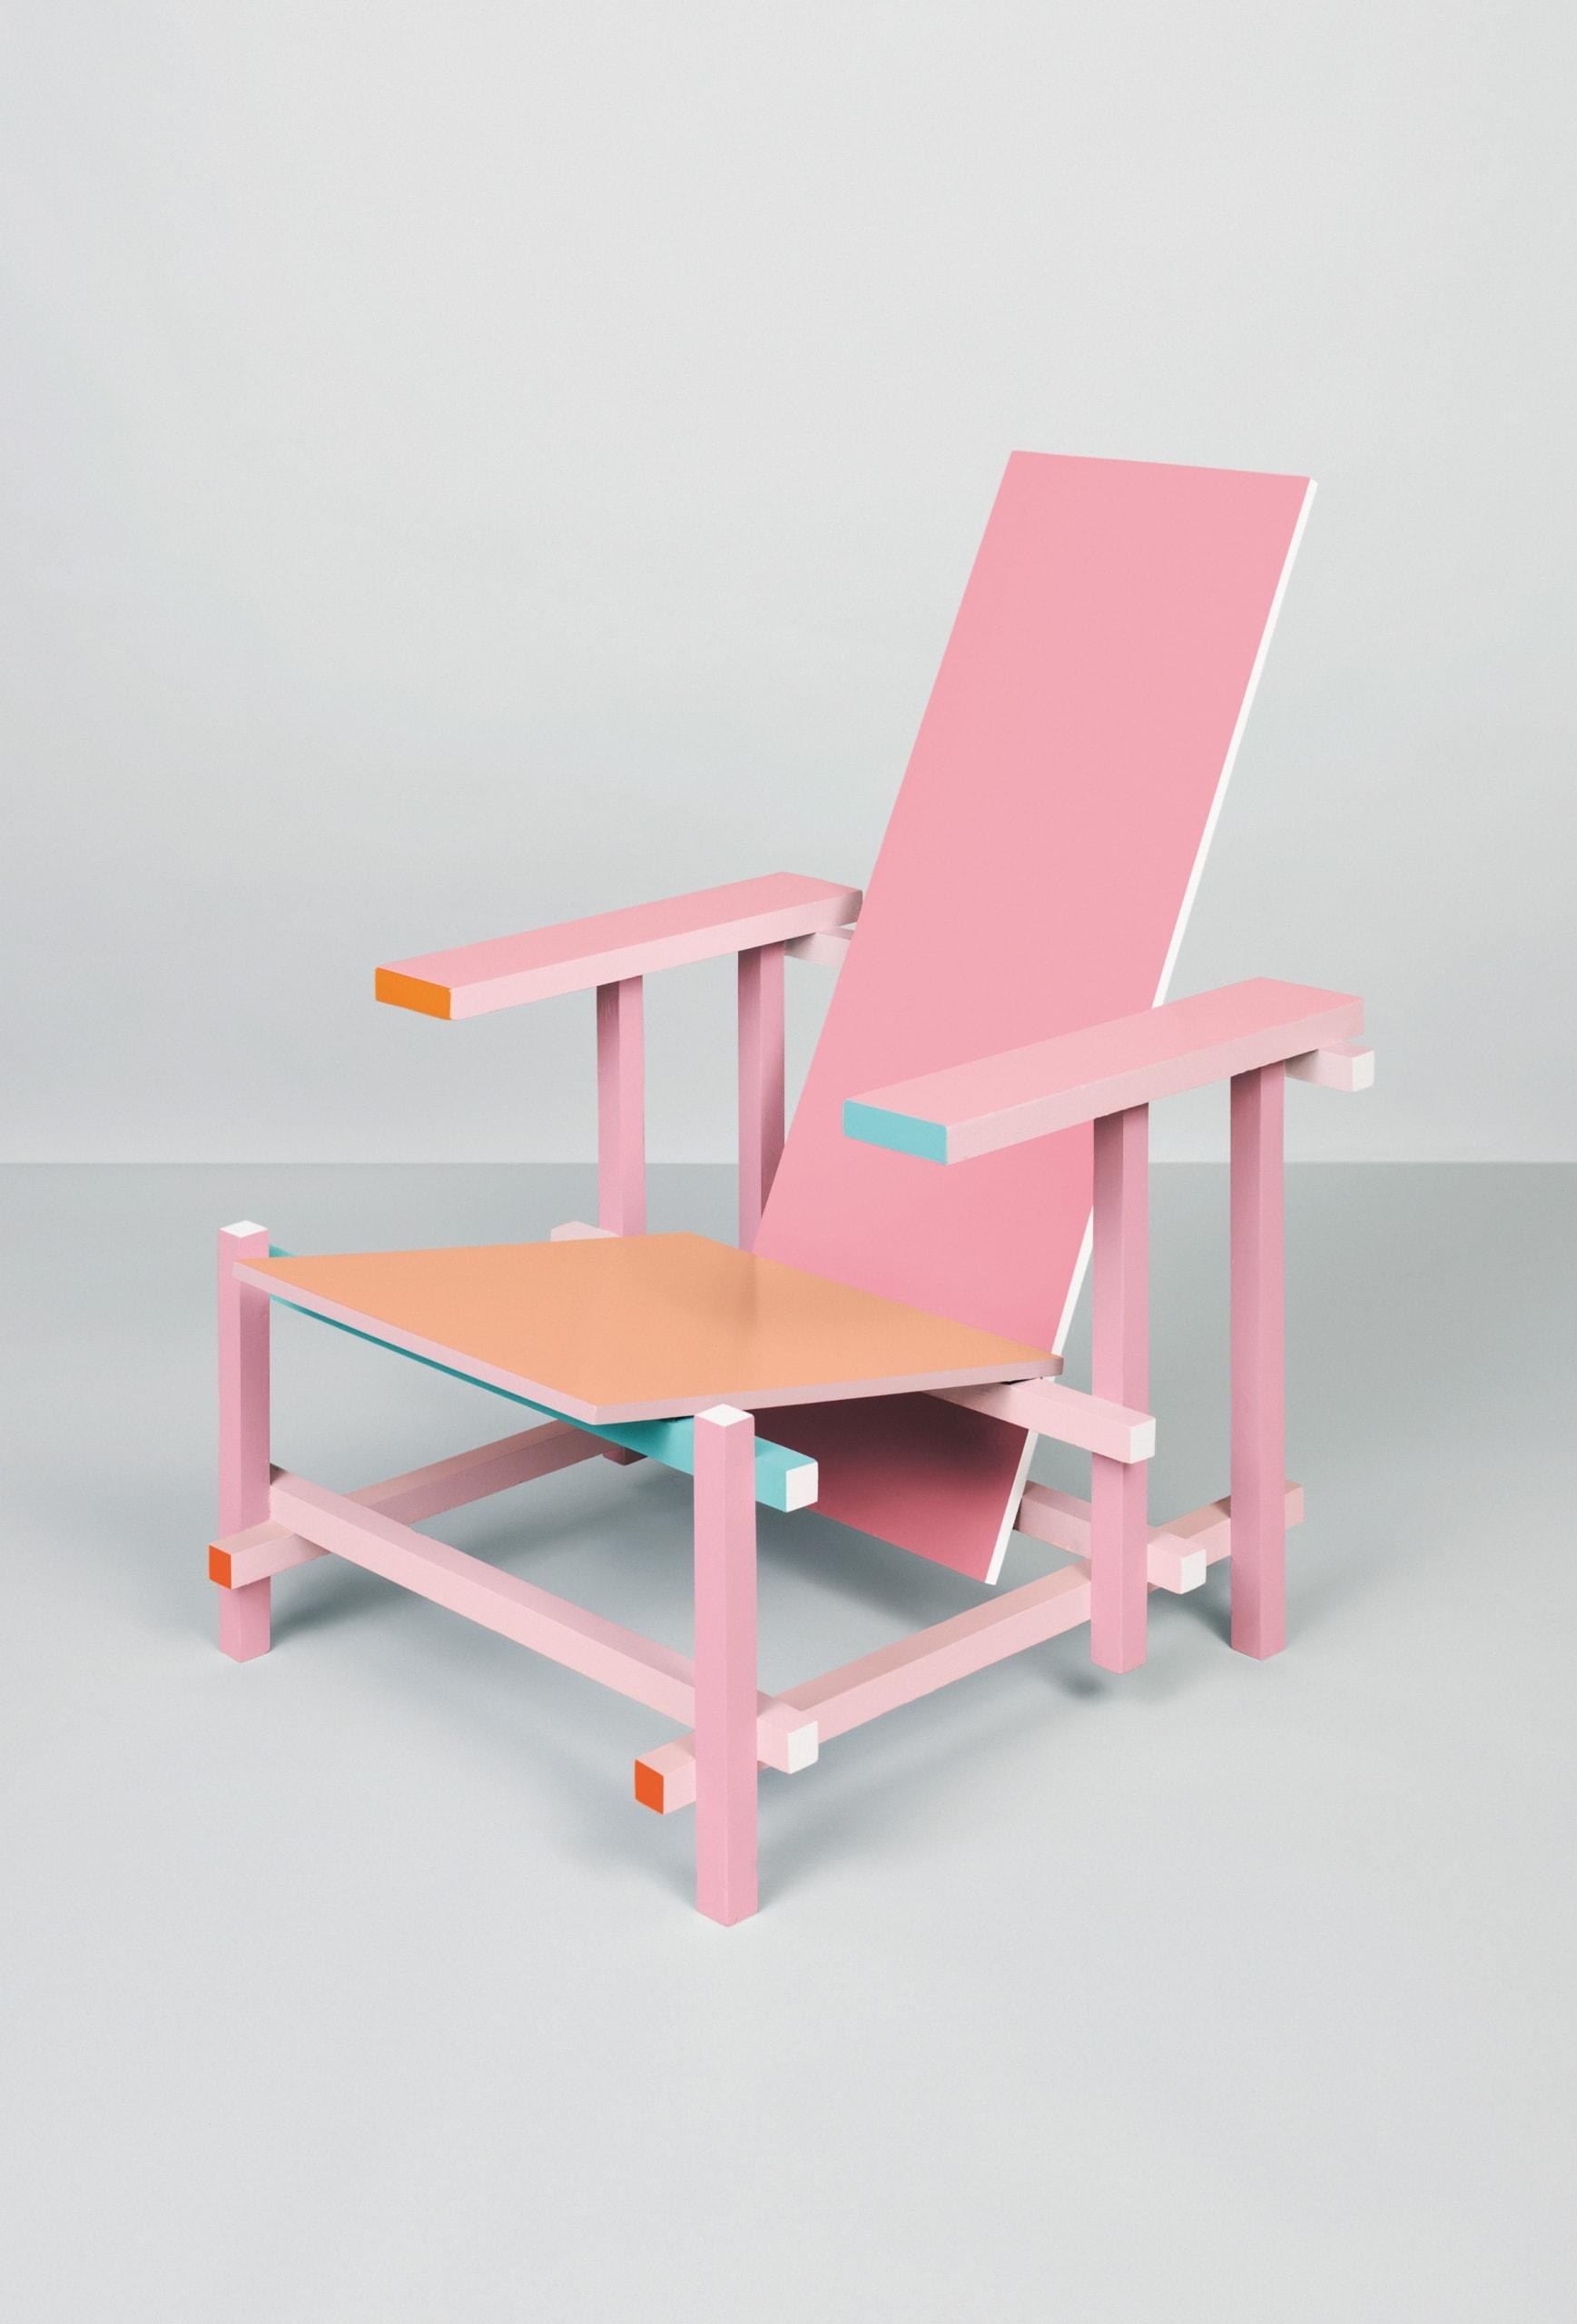 Studio Sander Plug – Deneuve - Sikkens